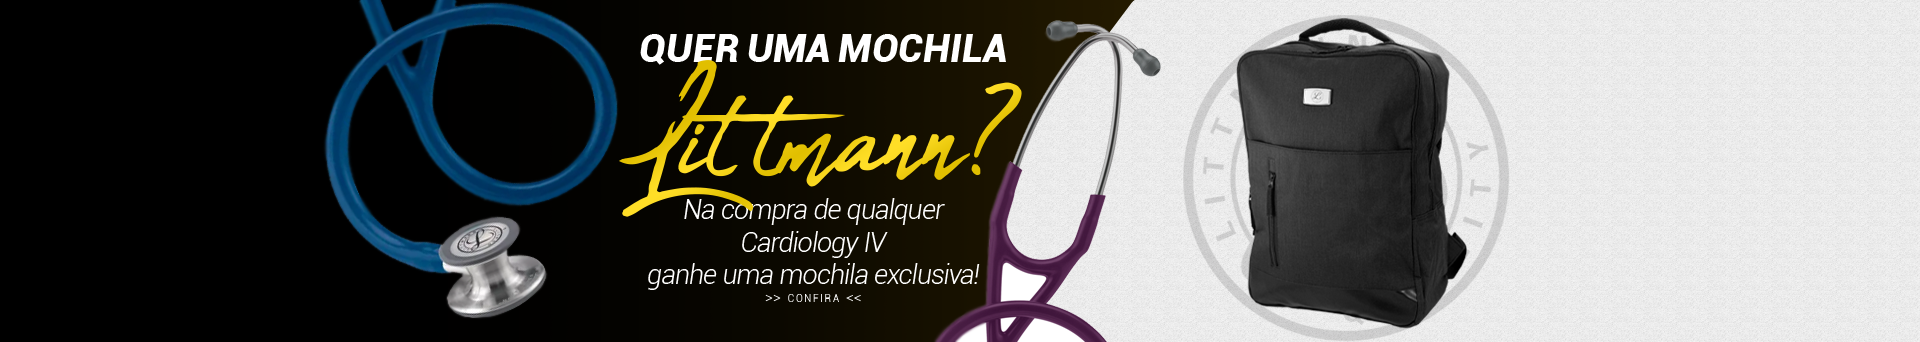 Promo Mochila